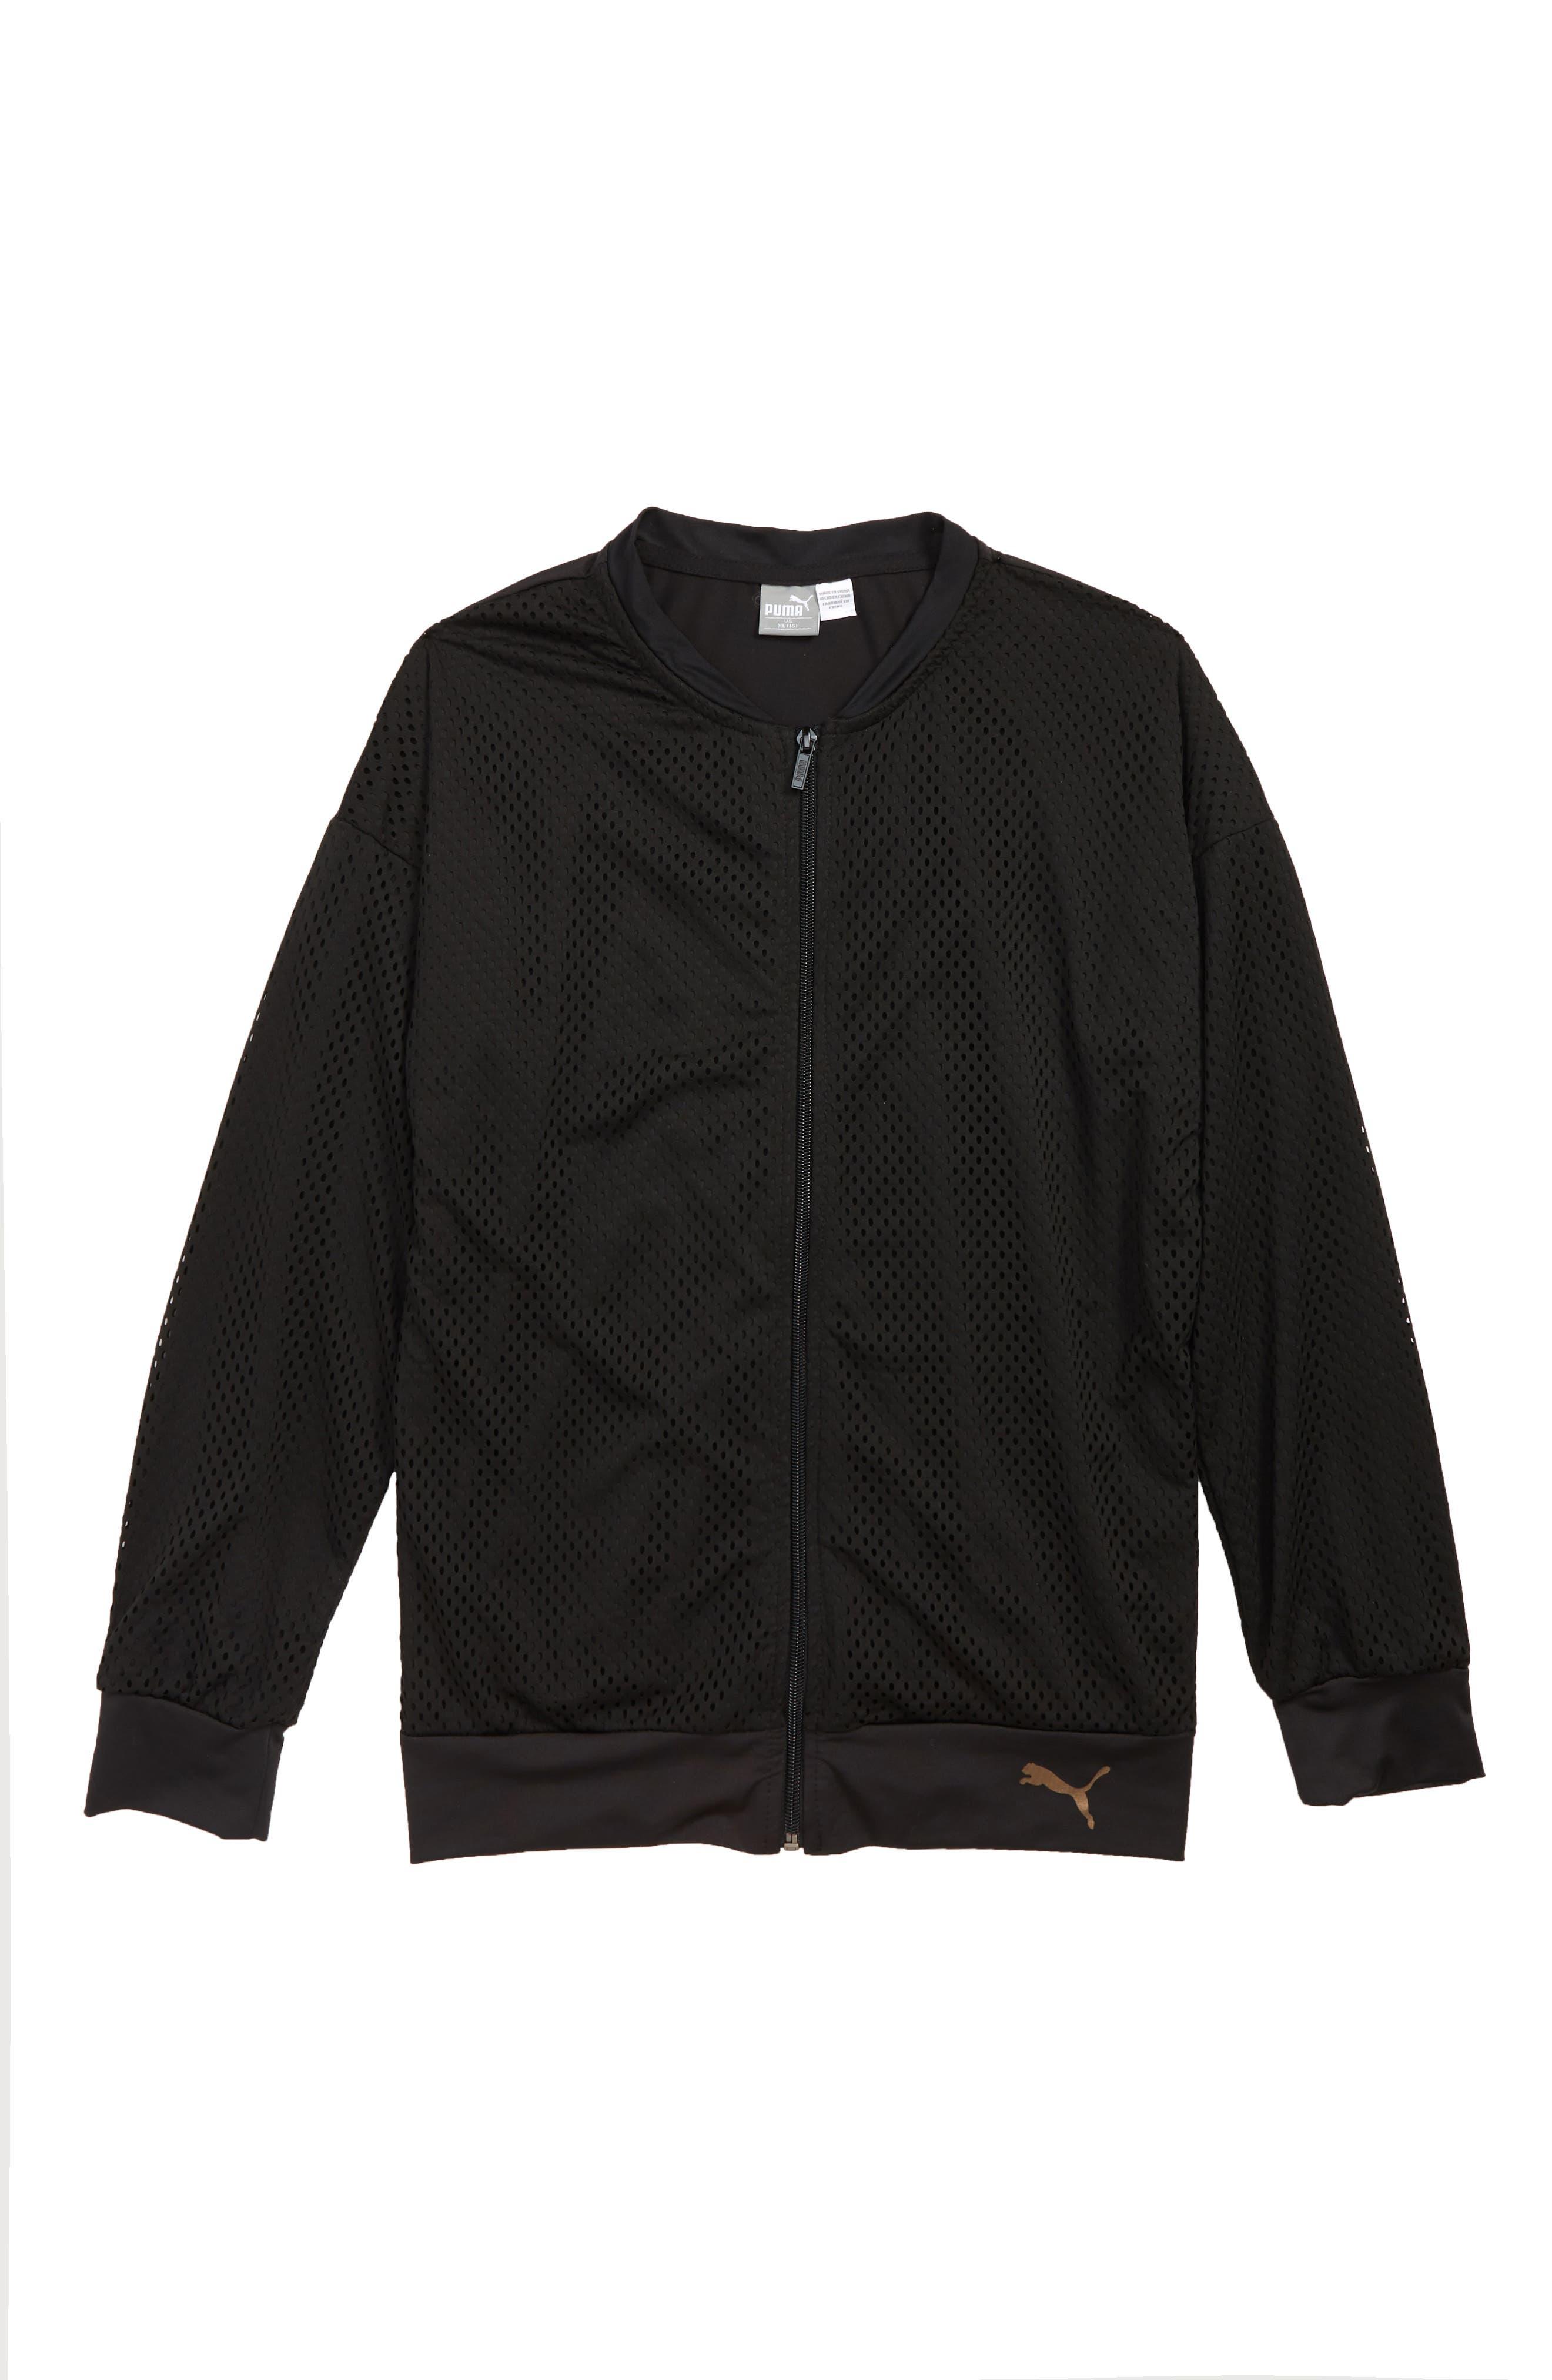 Mesh Bomber Jacket,                         Main,                         color, PUMA BLACK